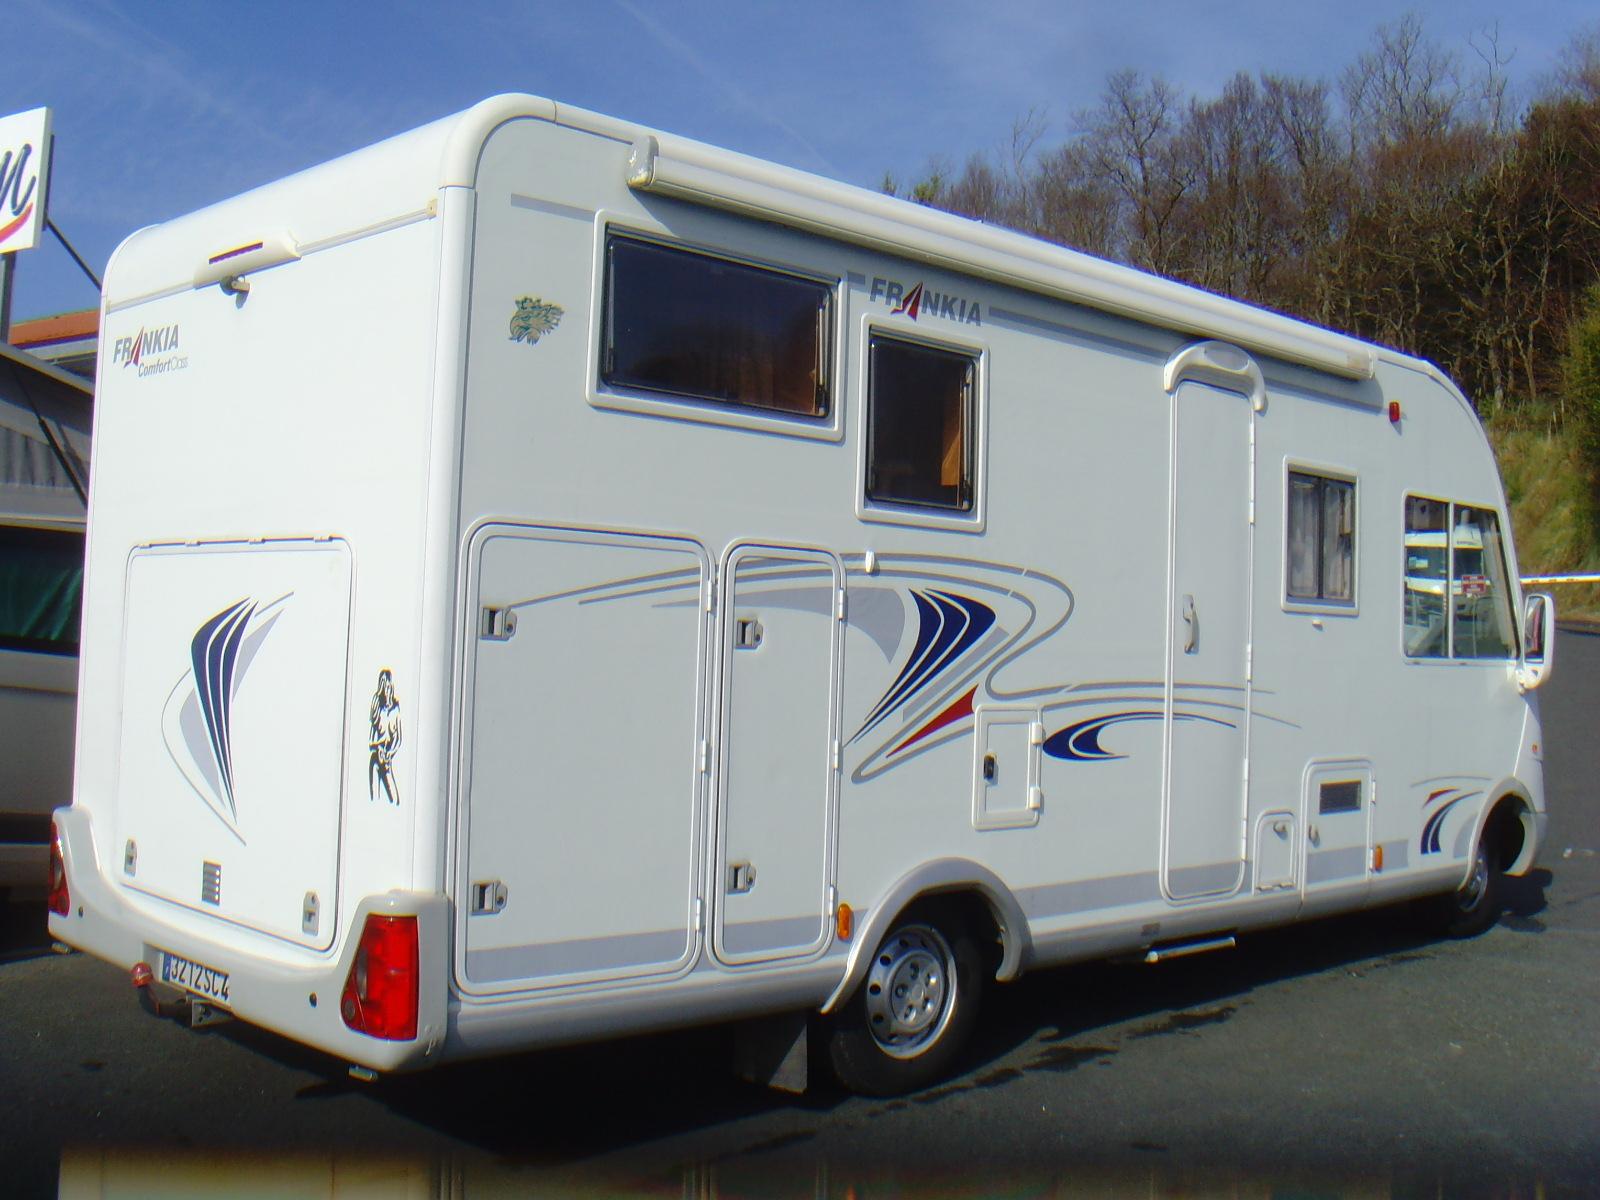 frankia i 700 bd occasion de 2002 fiat camping car en vente bayonne pyrenees atlantiques 64. Black Bedroom Furniture Sets. Home Design Ideas